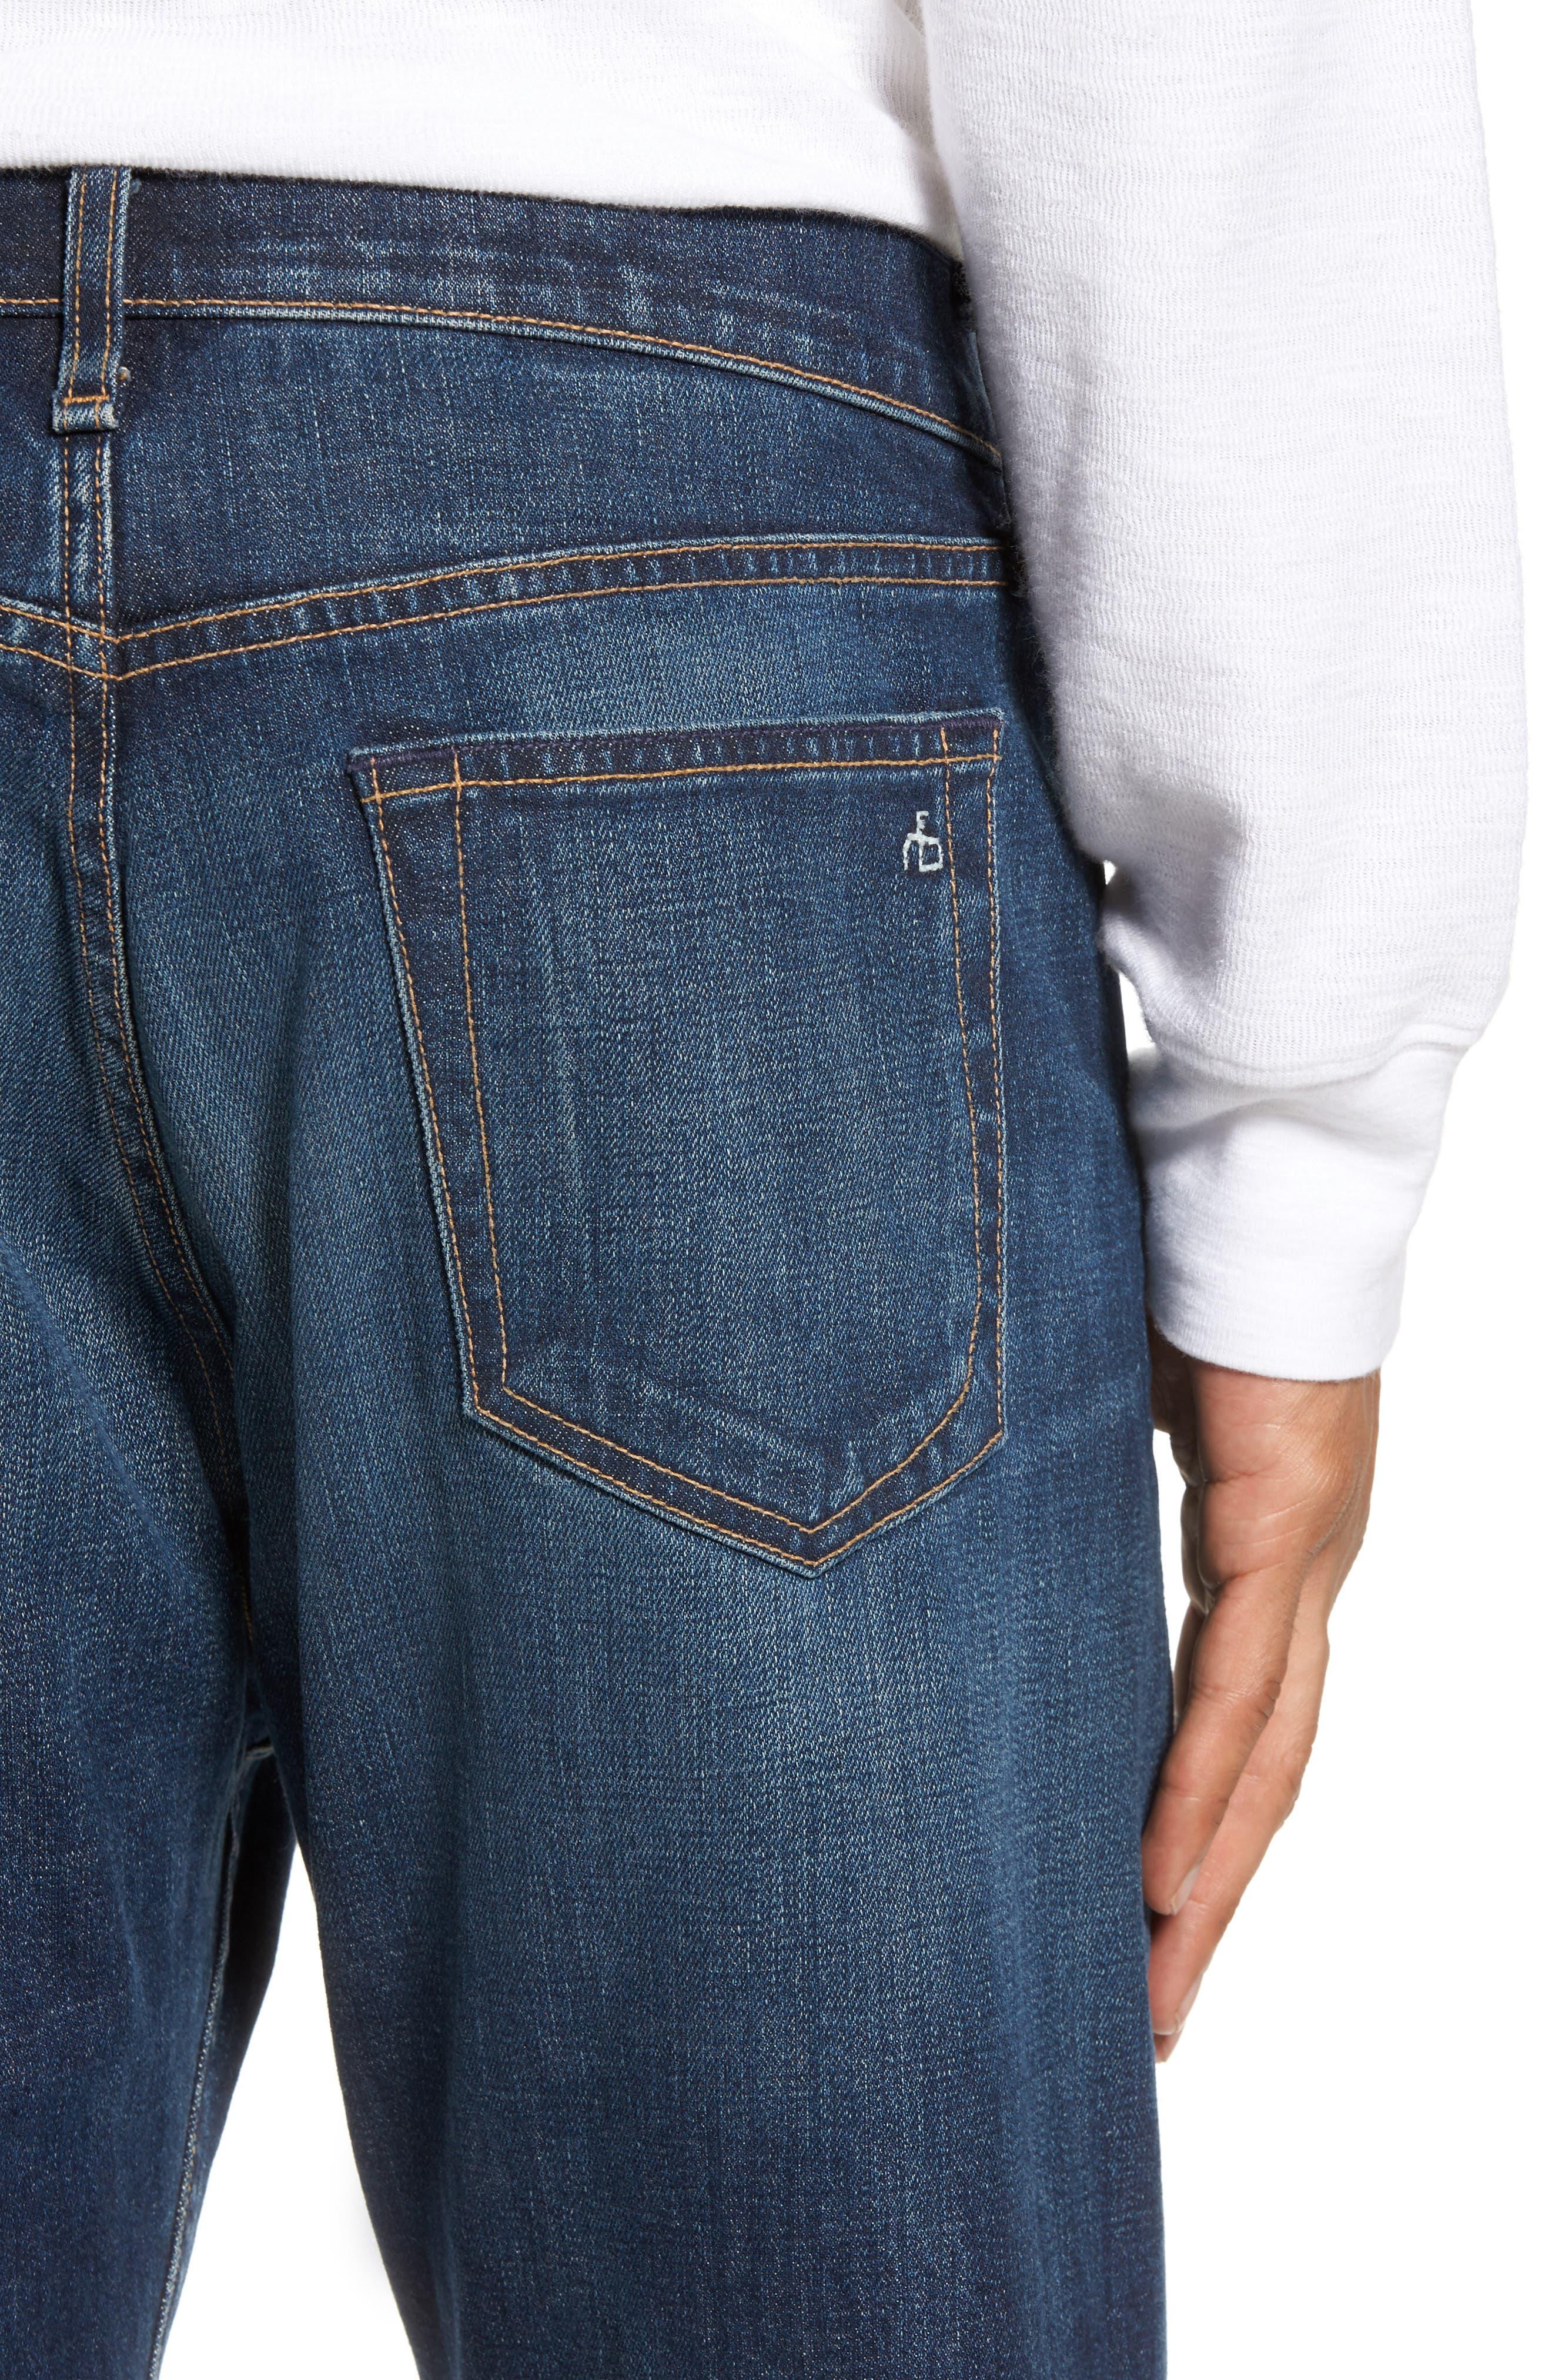 Fit 3 Slim Straight Leg Jeans,                             Alternate thumbnail 4, color,                             Linden